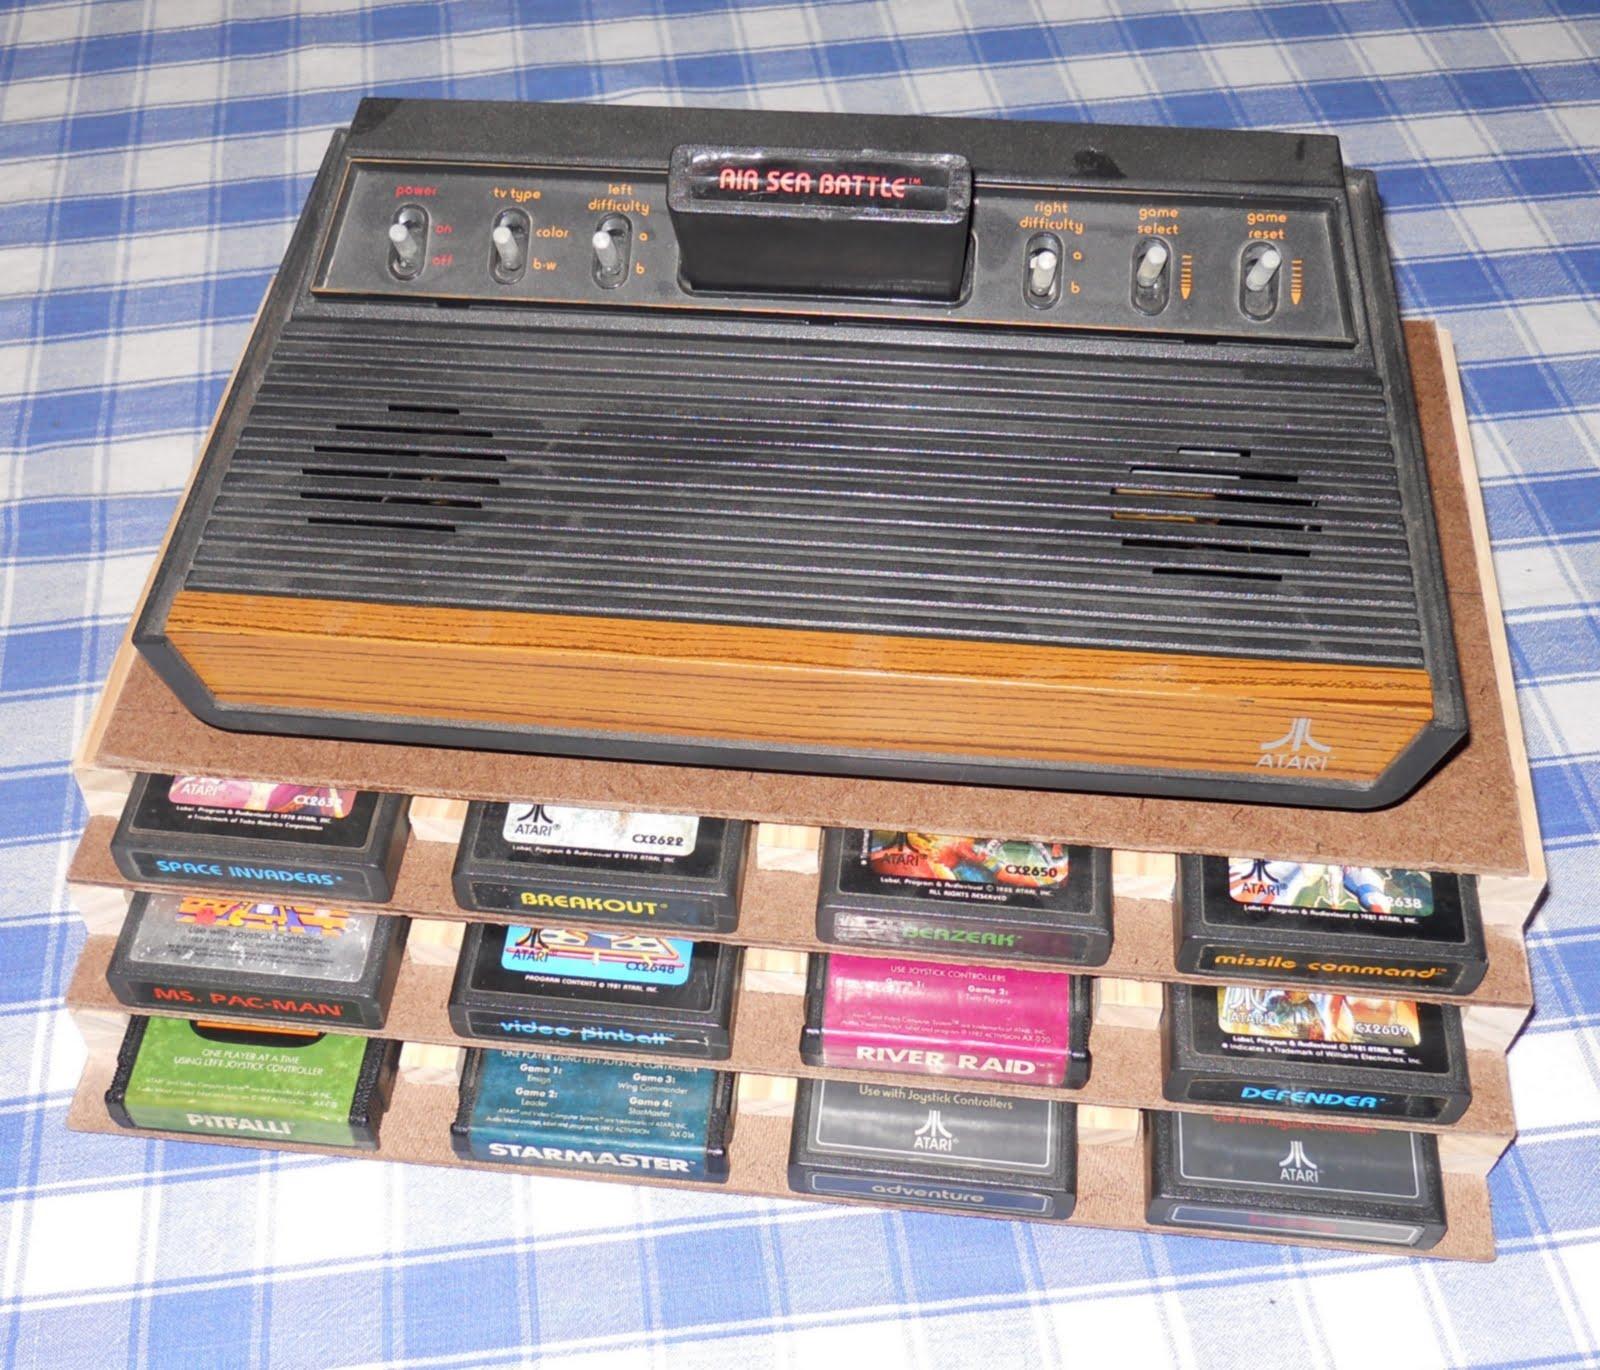 Atari Storage System